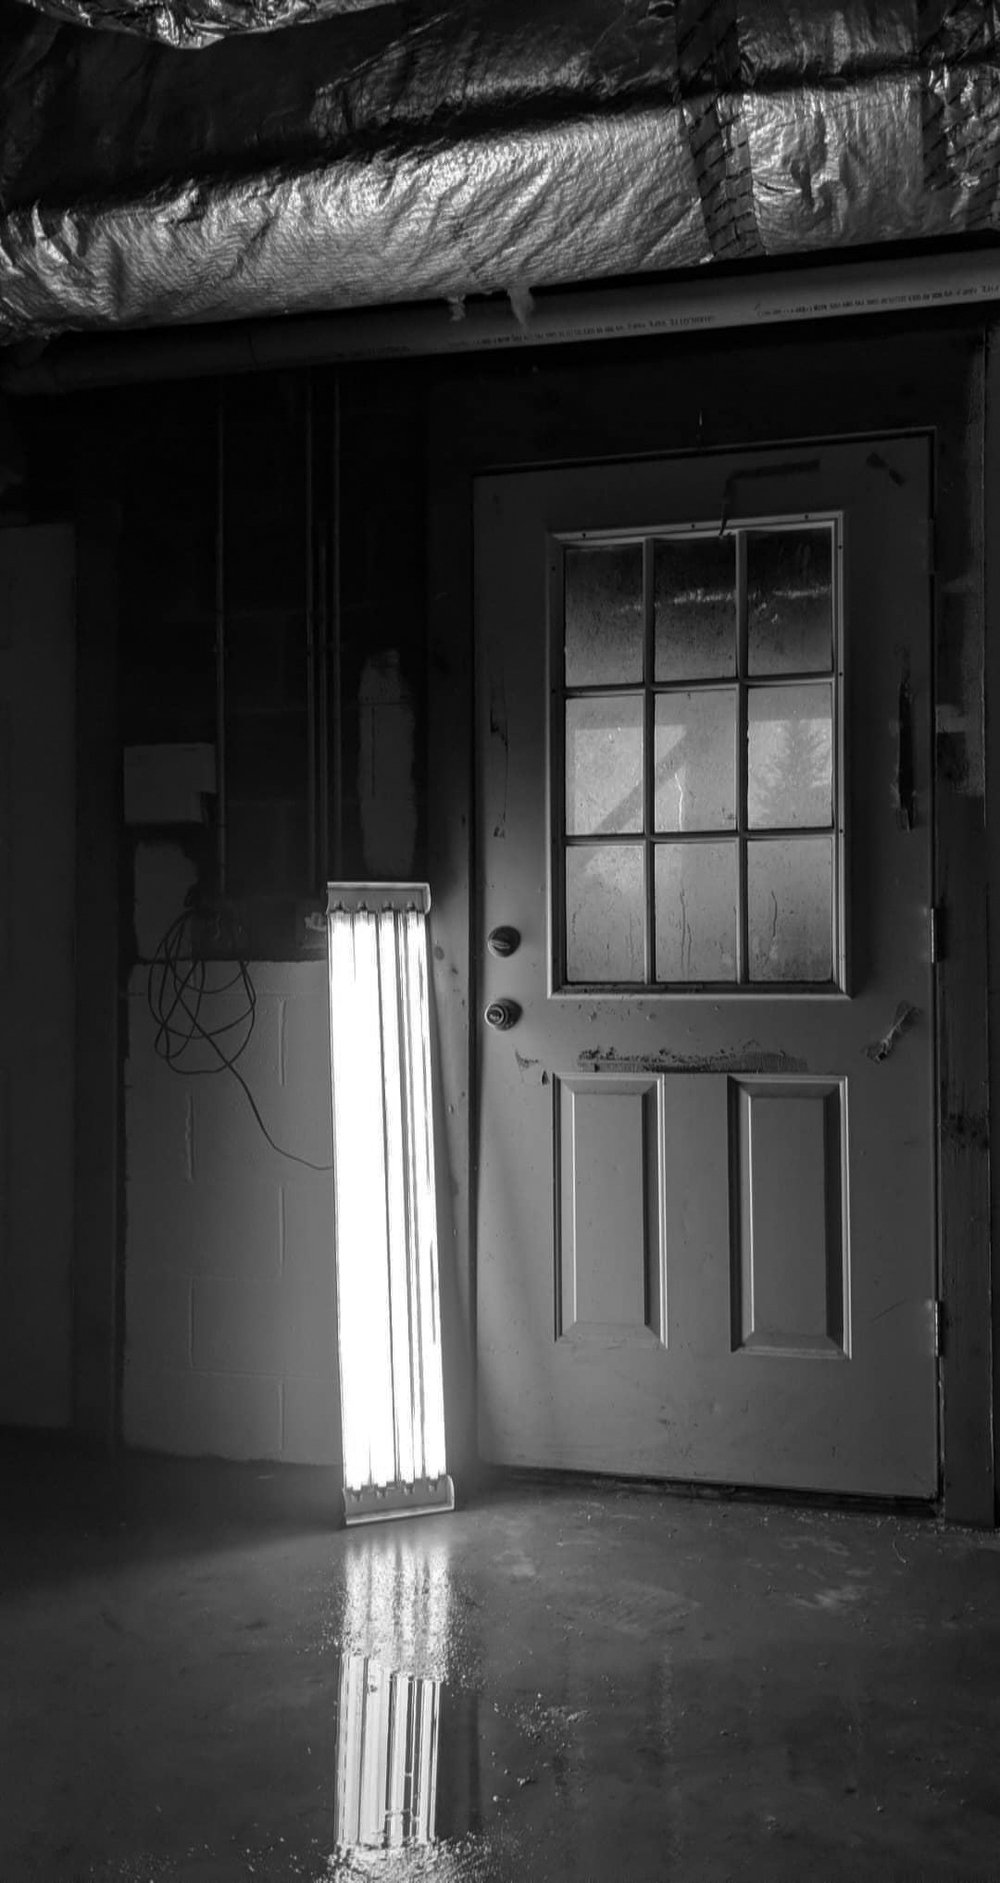 jims_basement.jpg